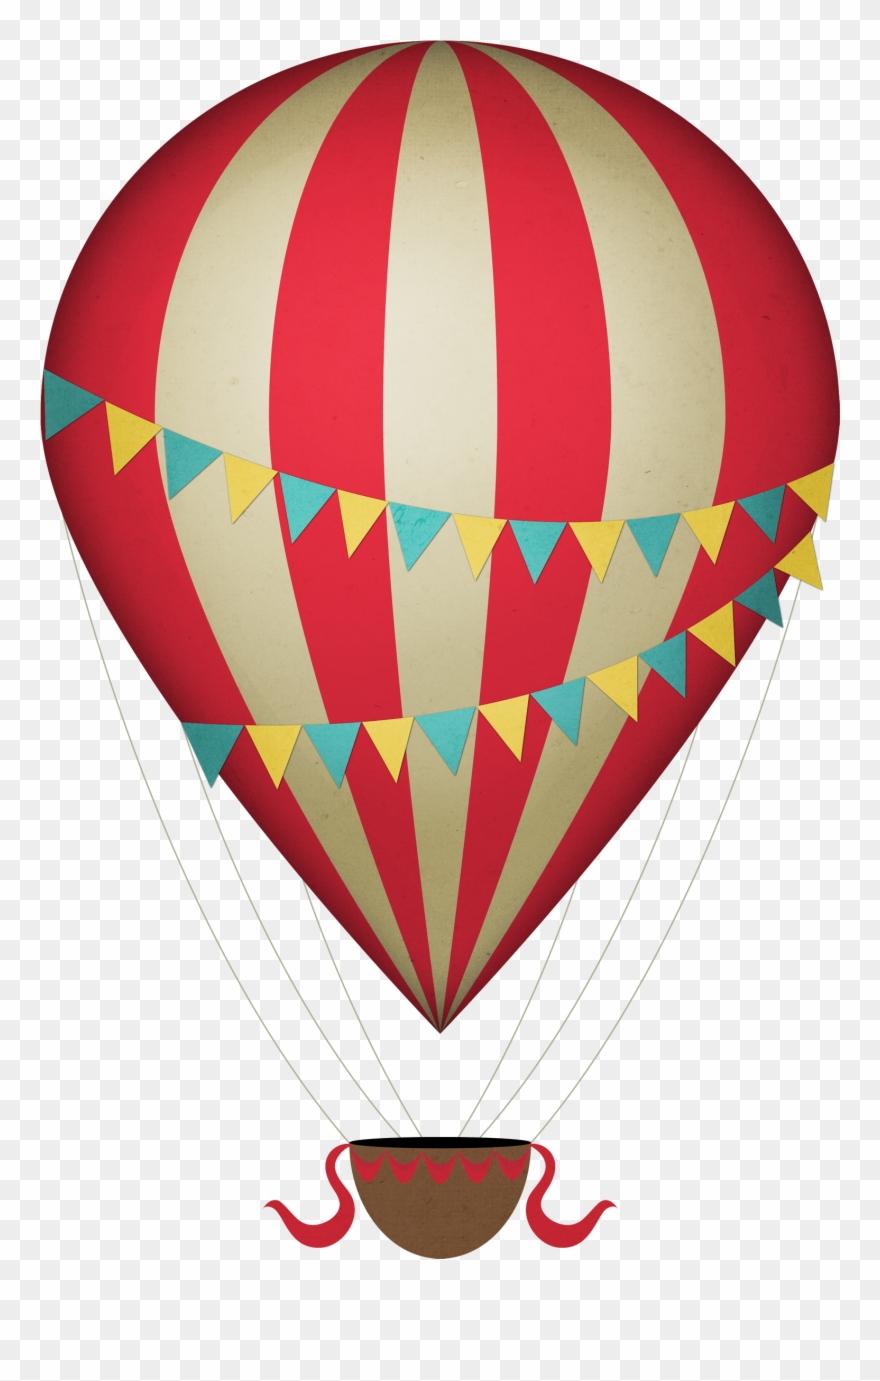 Hotair balloon clipart royalty free library Graphic Freeuse Stock Hot Air Balloon Clipart - Air Balloon ... royalty free library